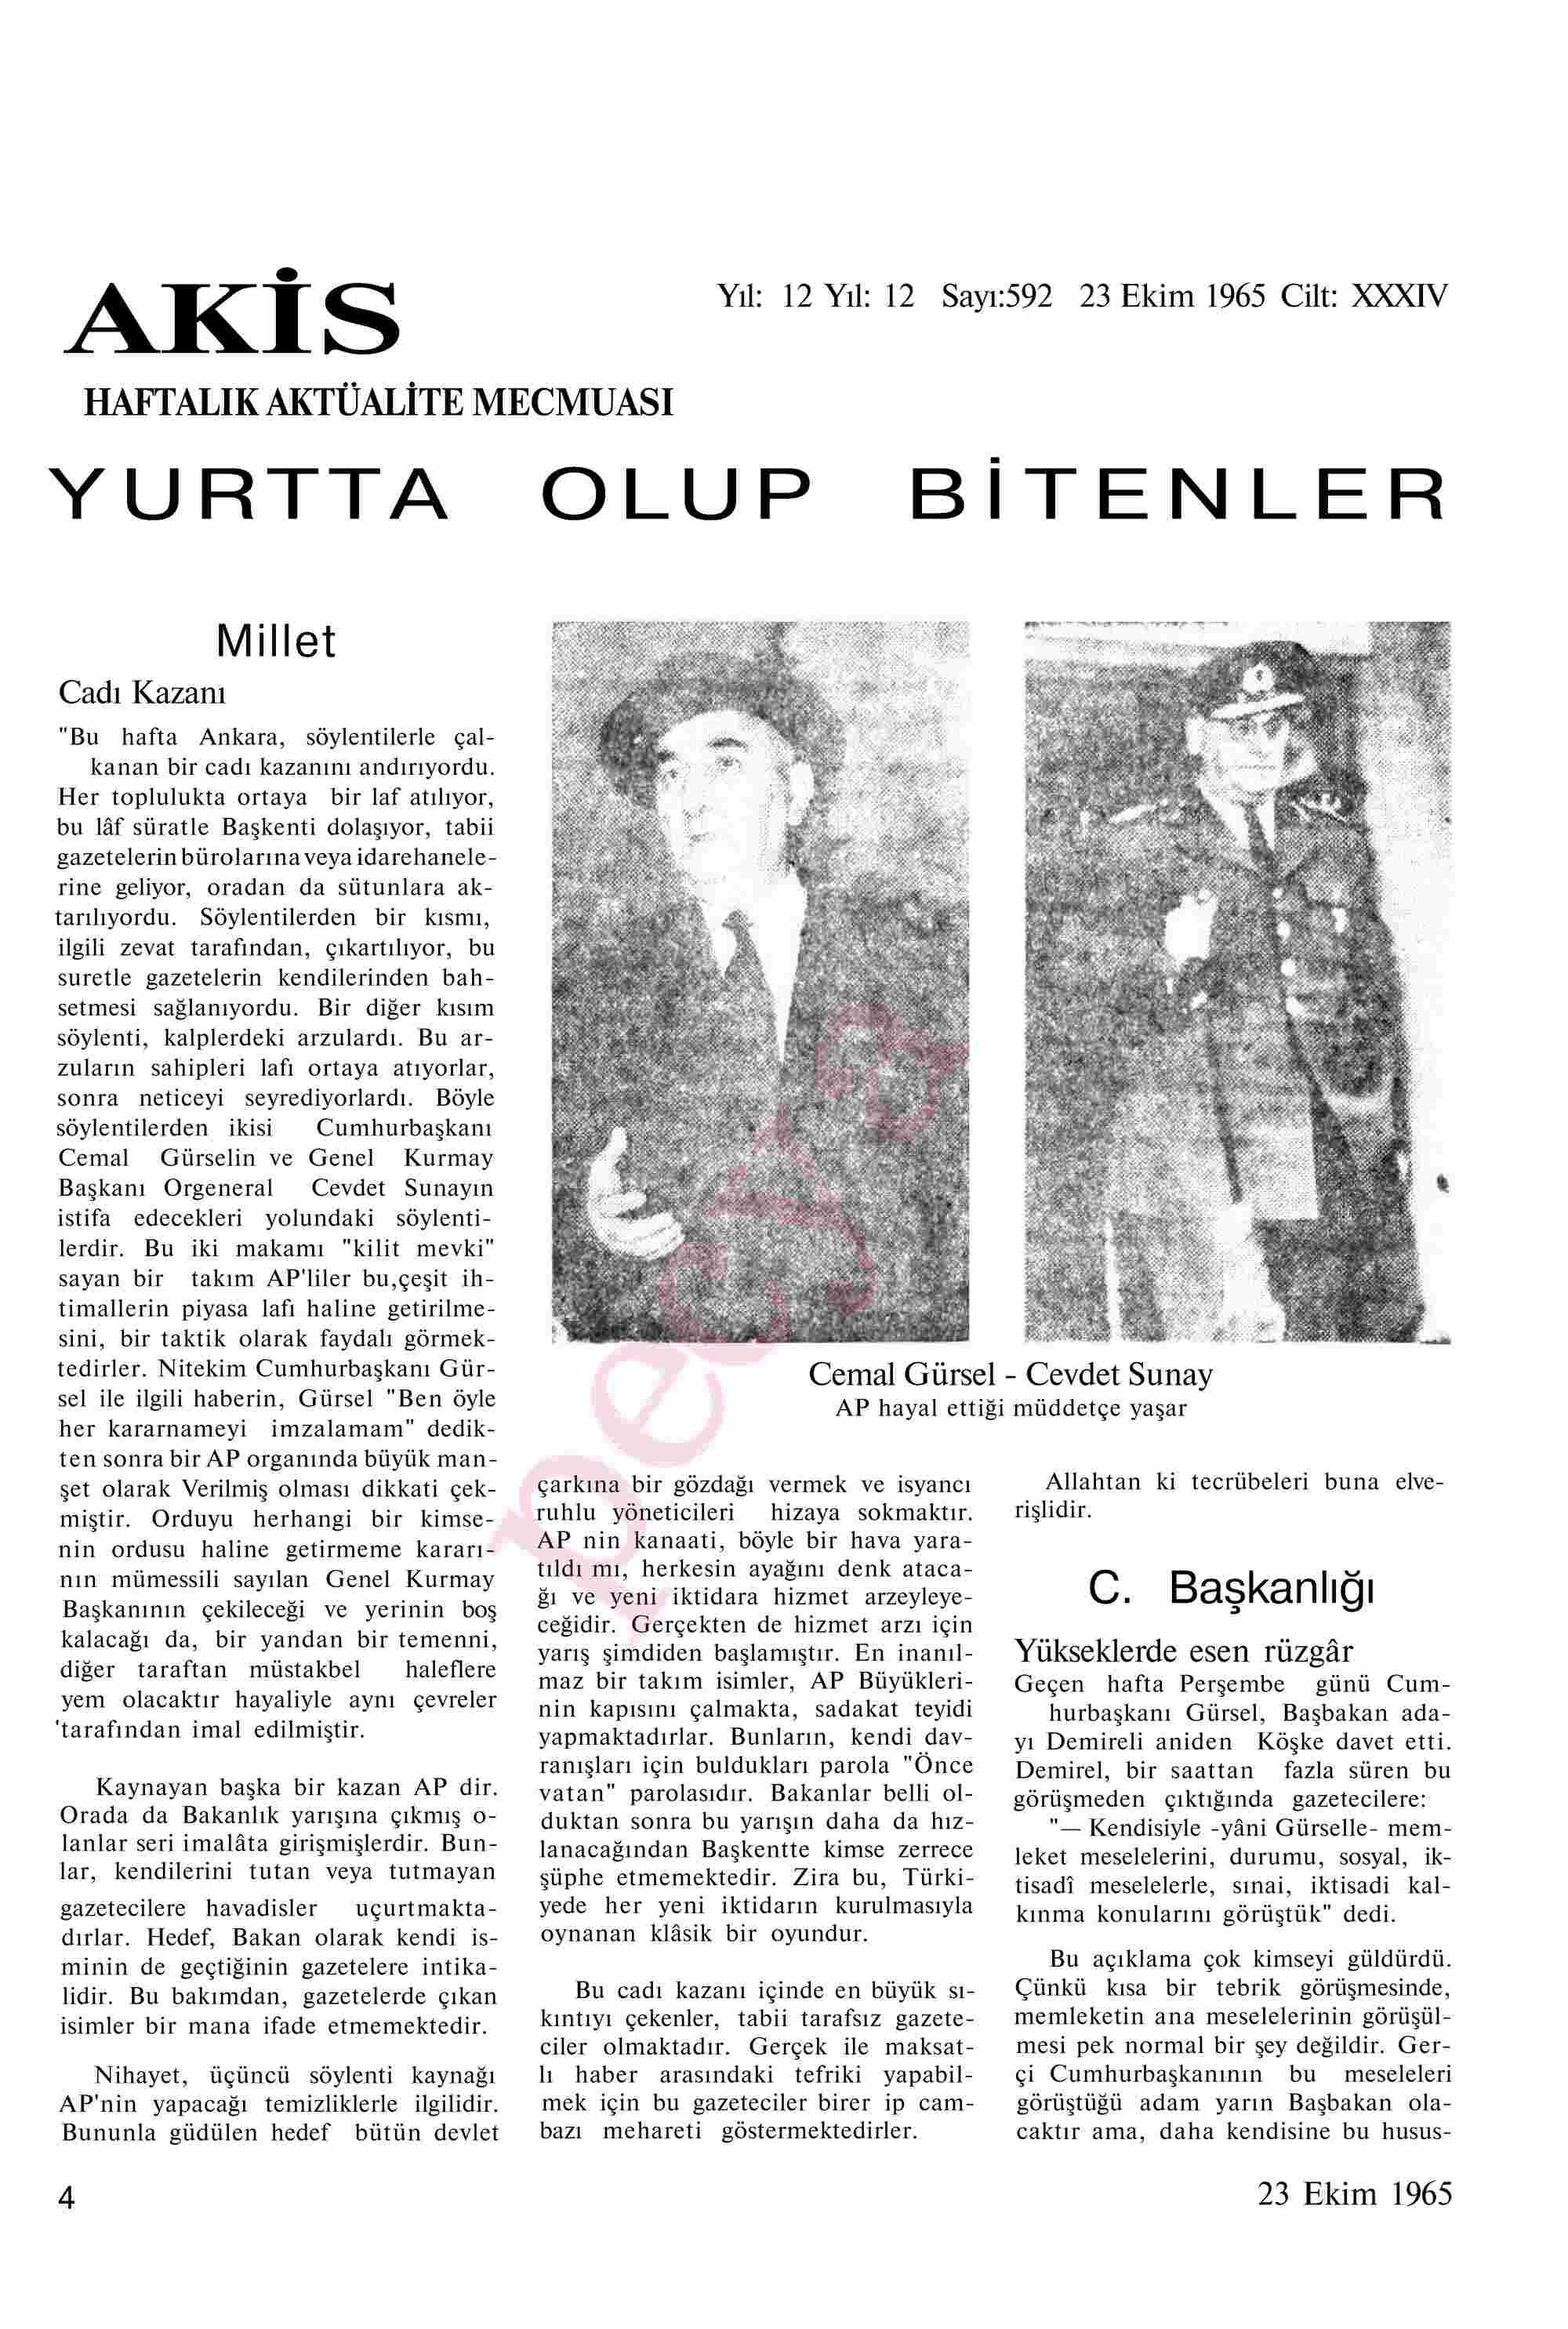 23 Ekim 1965 Tarihli Akis Dergisi Sayfa 4